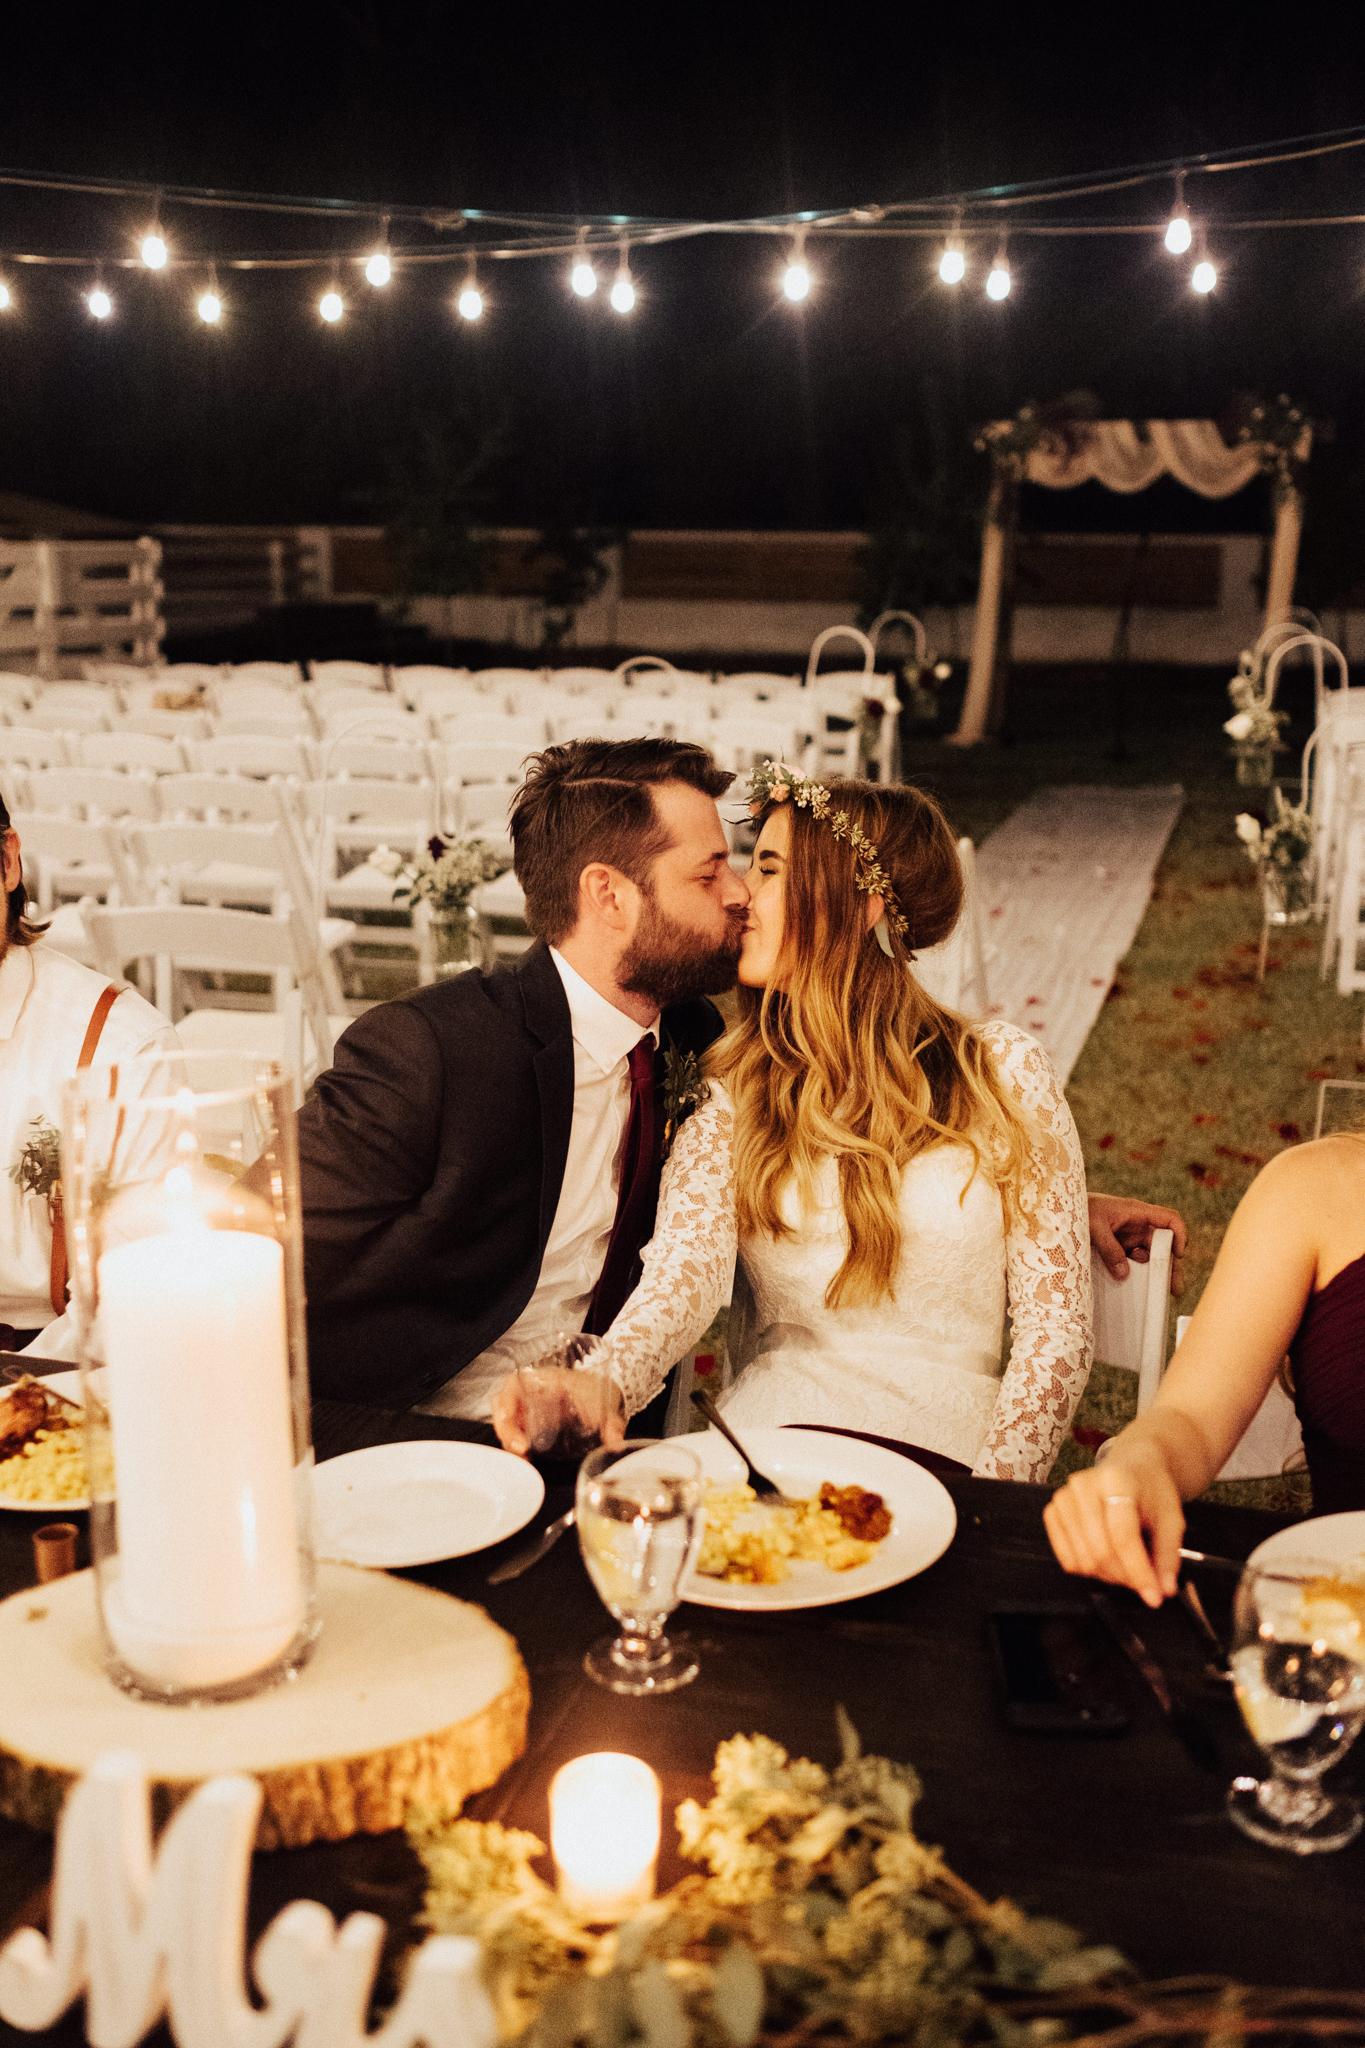 Arizona-Adventure-Elopement-Wedding-Photographer-144.jpg